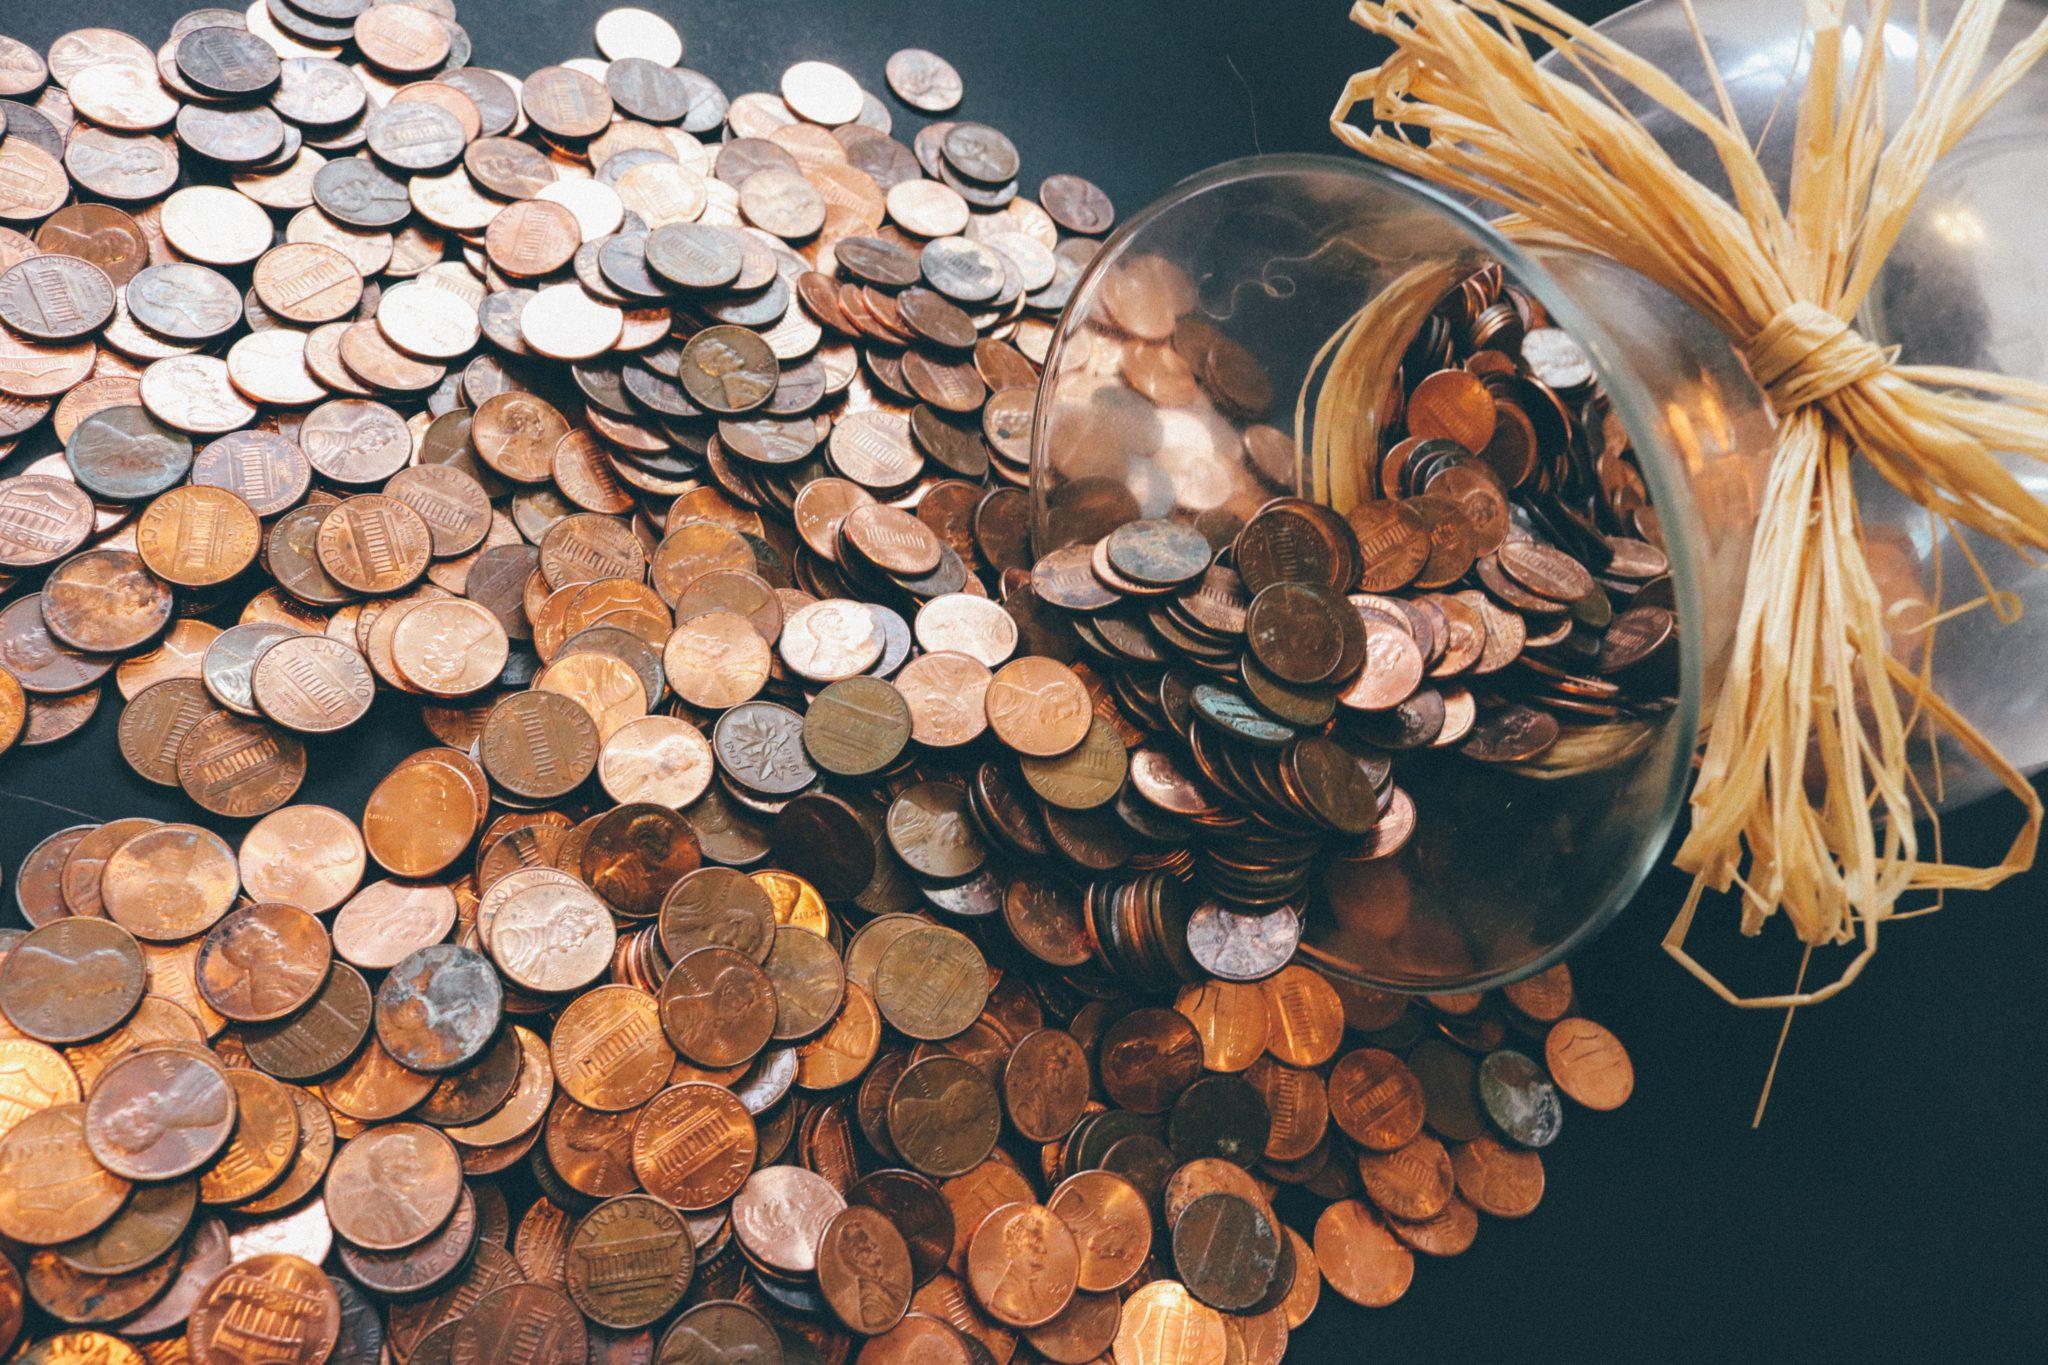 cashflow problems